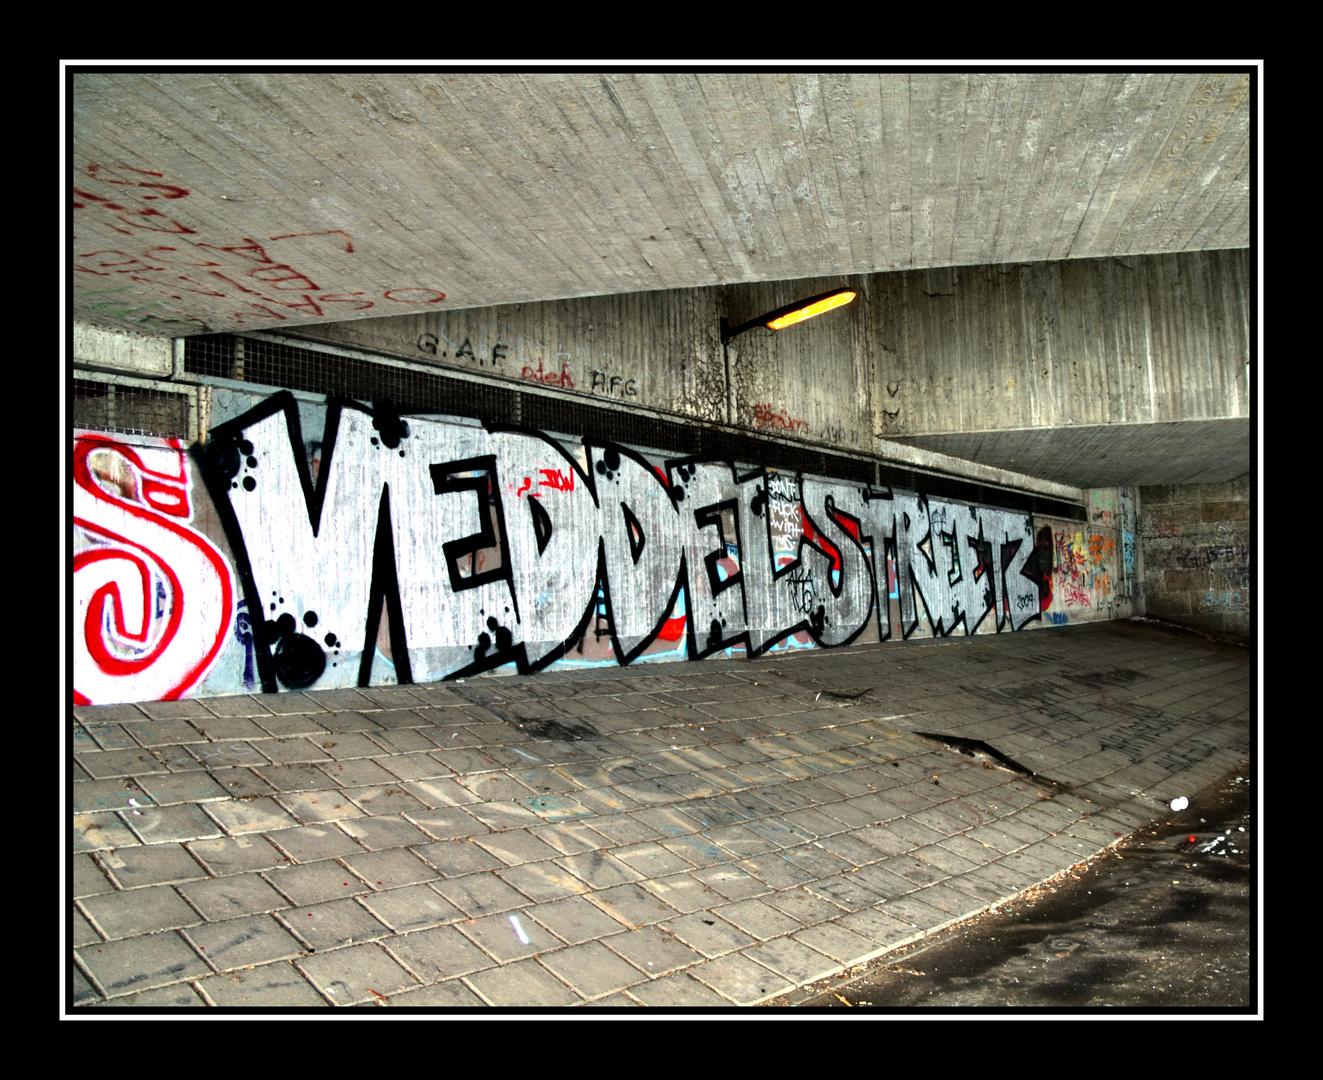 Veddelstreetz